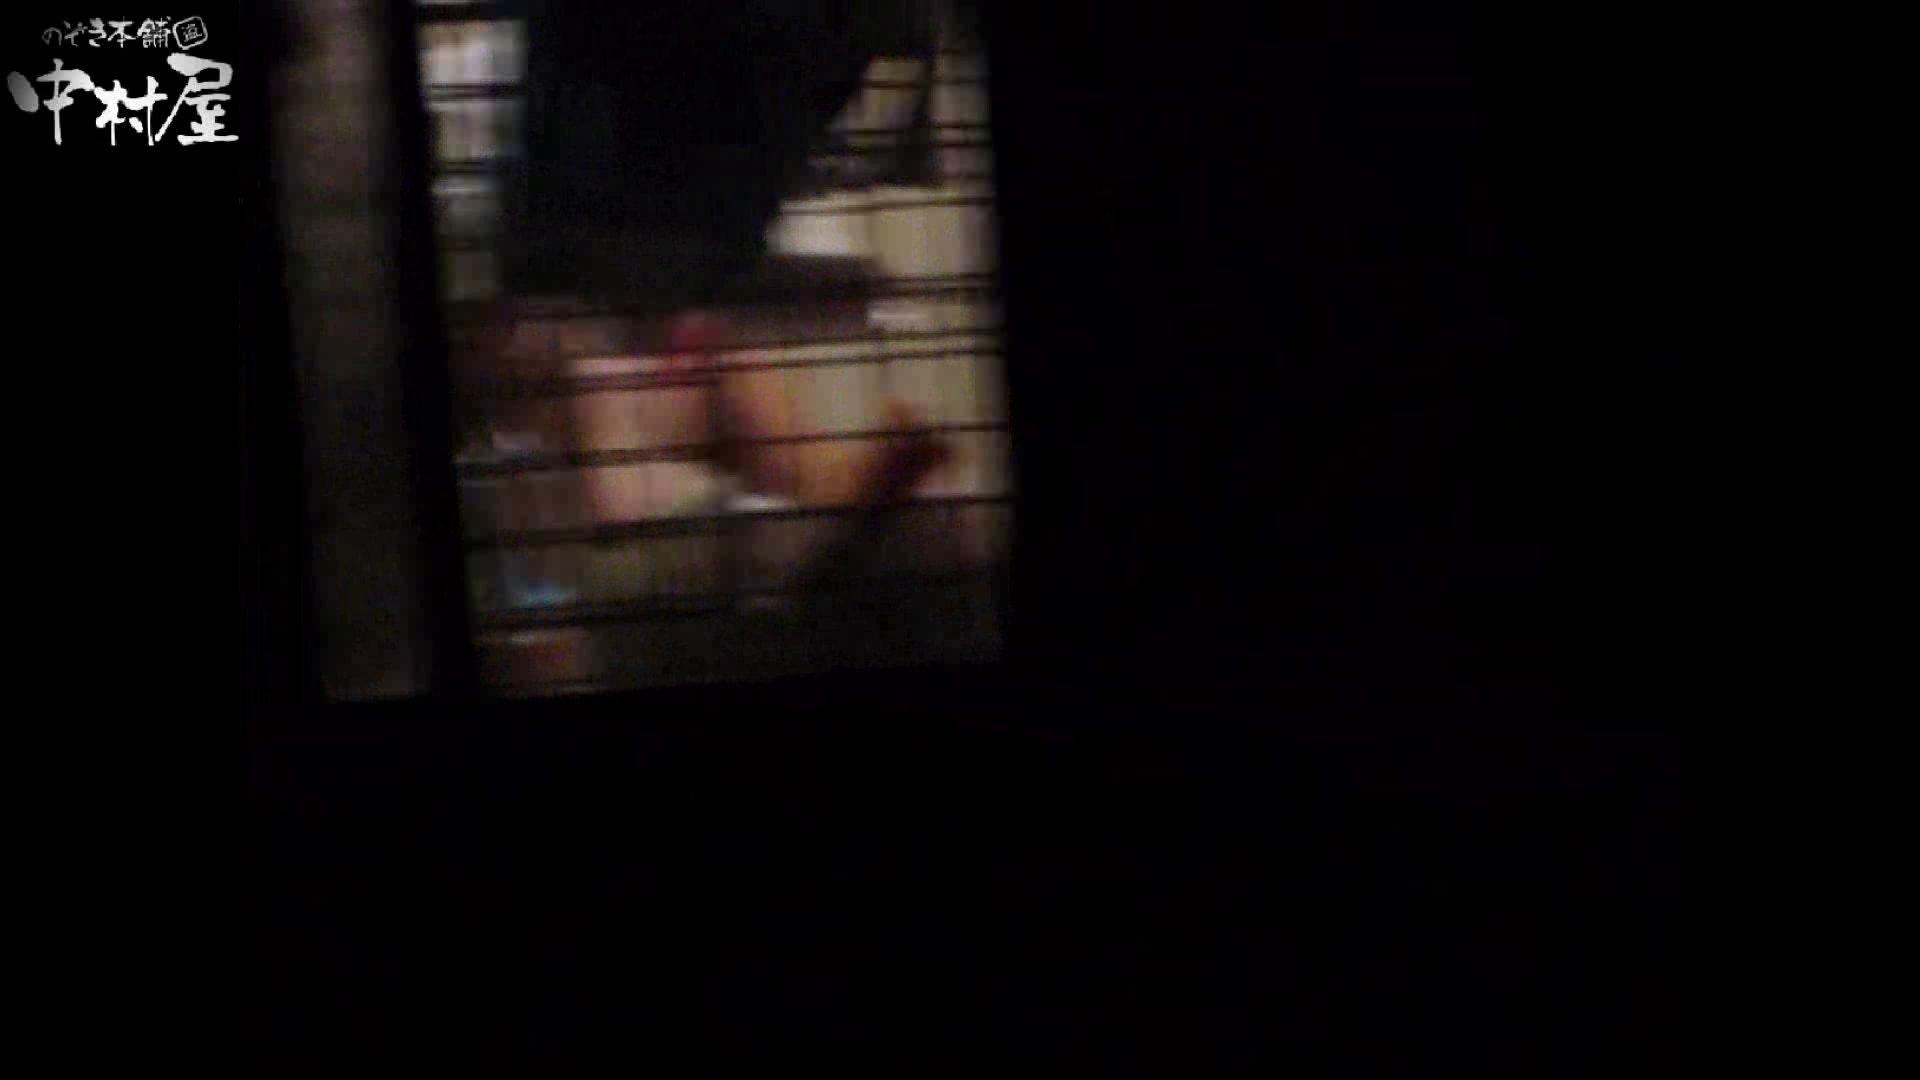 民家風呂専門盗撮師の超危険映像 vol.023 OLのエロ生活 性交動画流出 95連発 8